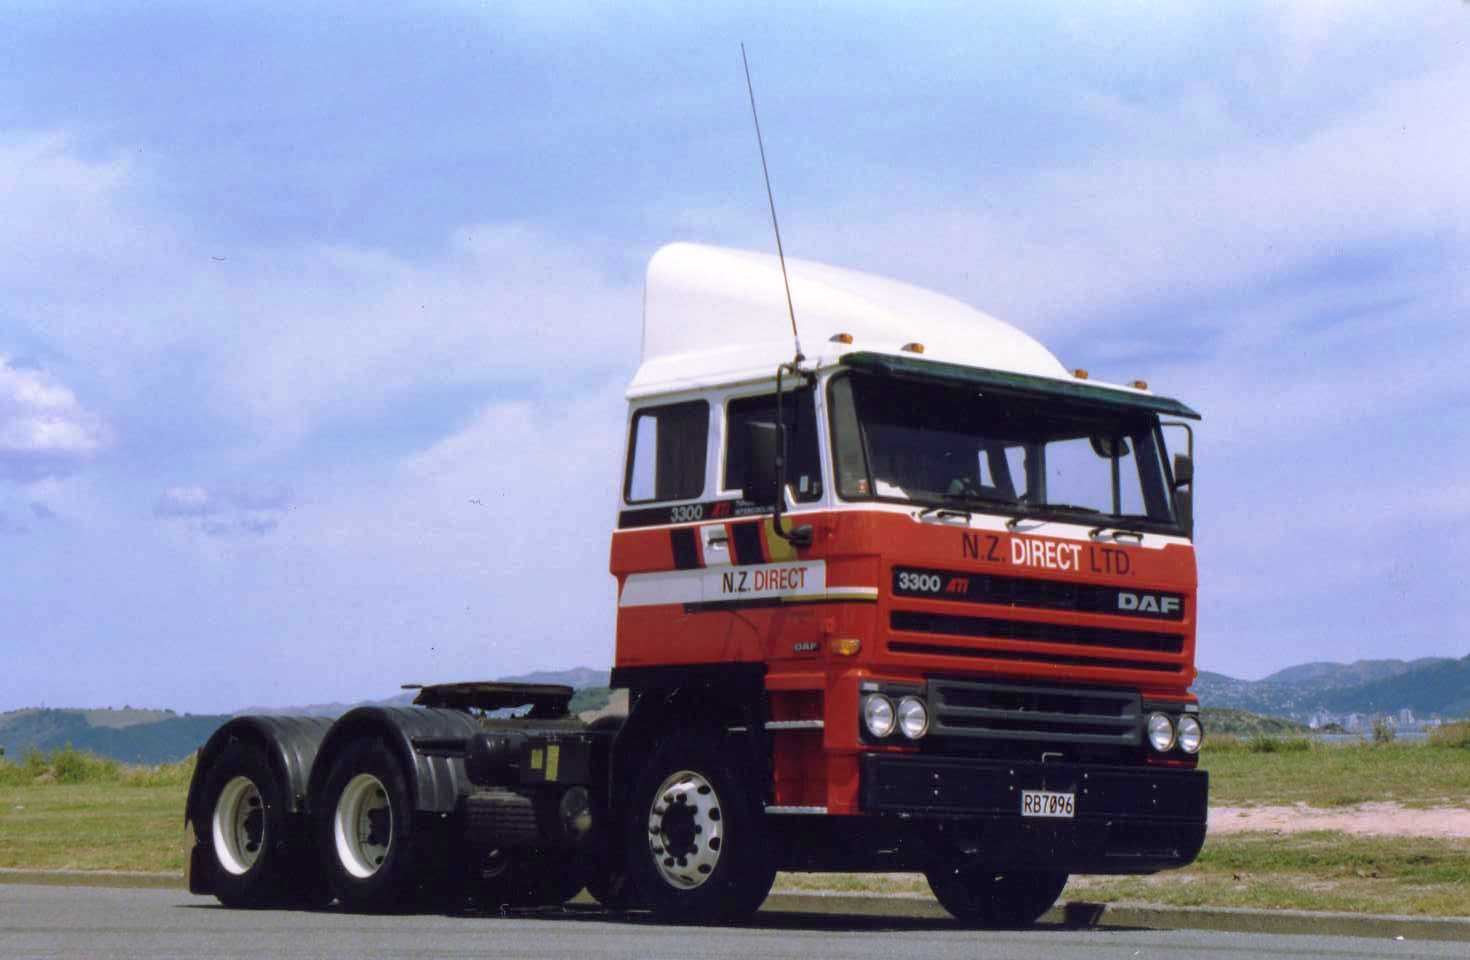 DAF-RB-7096-1990-FTT-3300